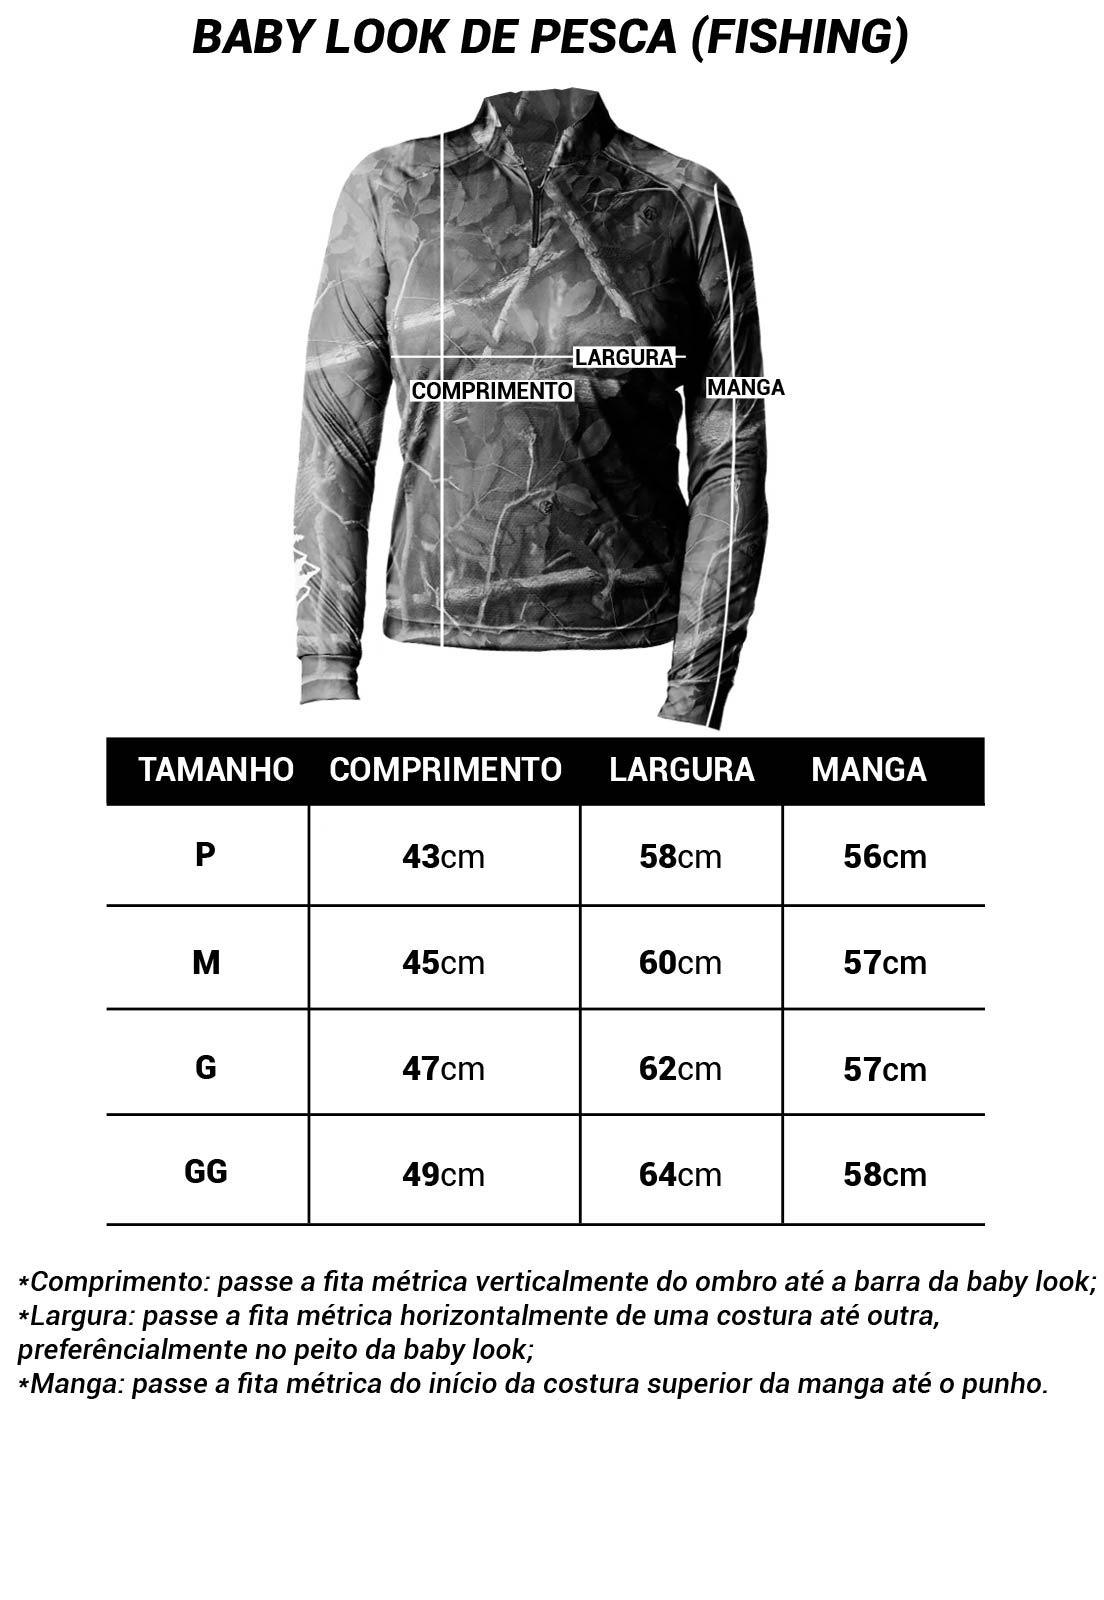 CAMISA DE PESCA FISH CAMUFLADA AMAZÔNIA 35 FEMININA + BANDANA GRÁTIS  - REAL HUNTER OUTDOORS